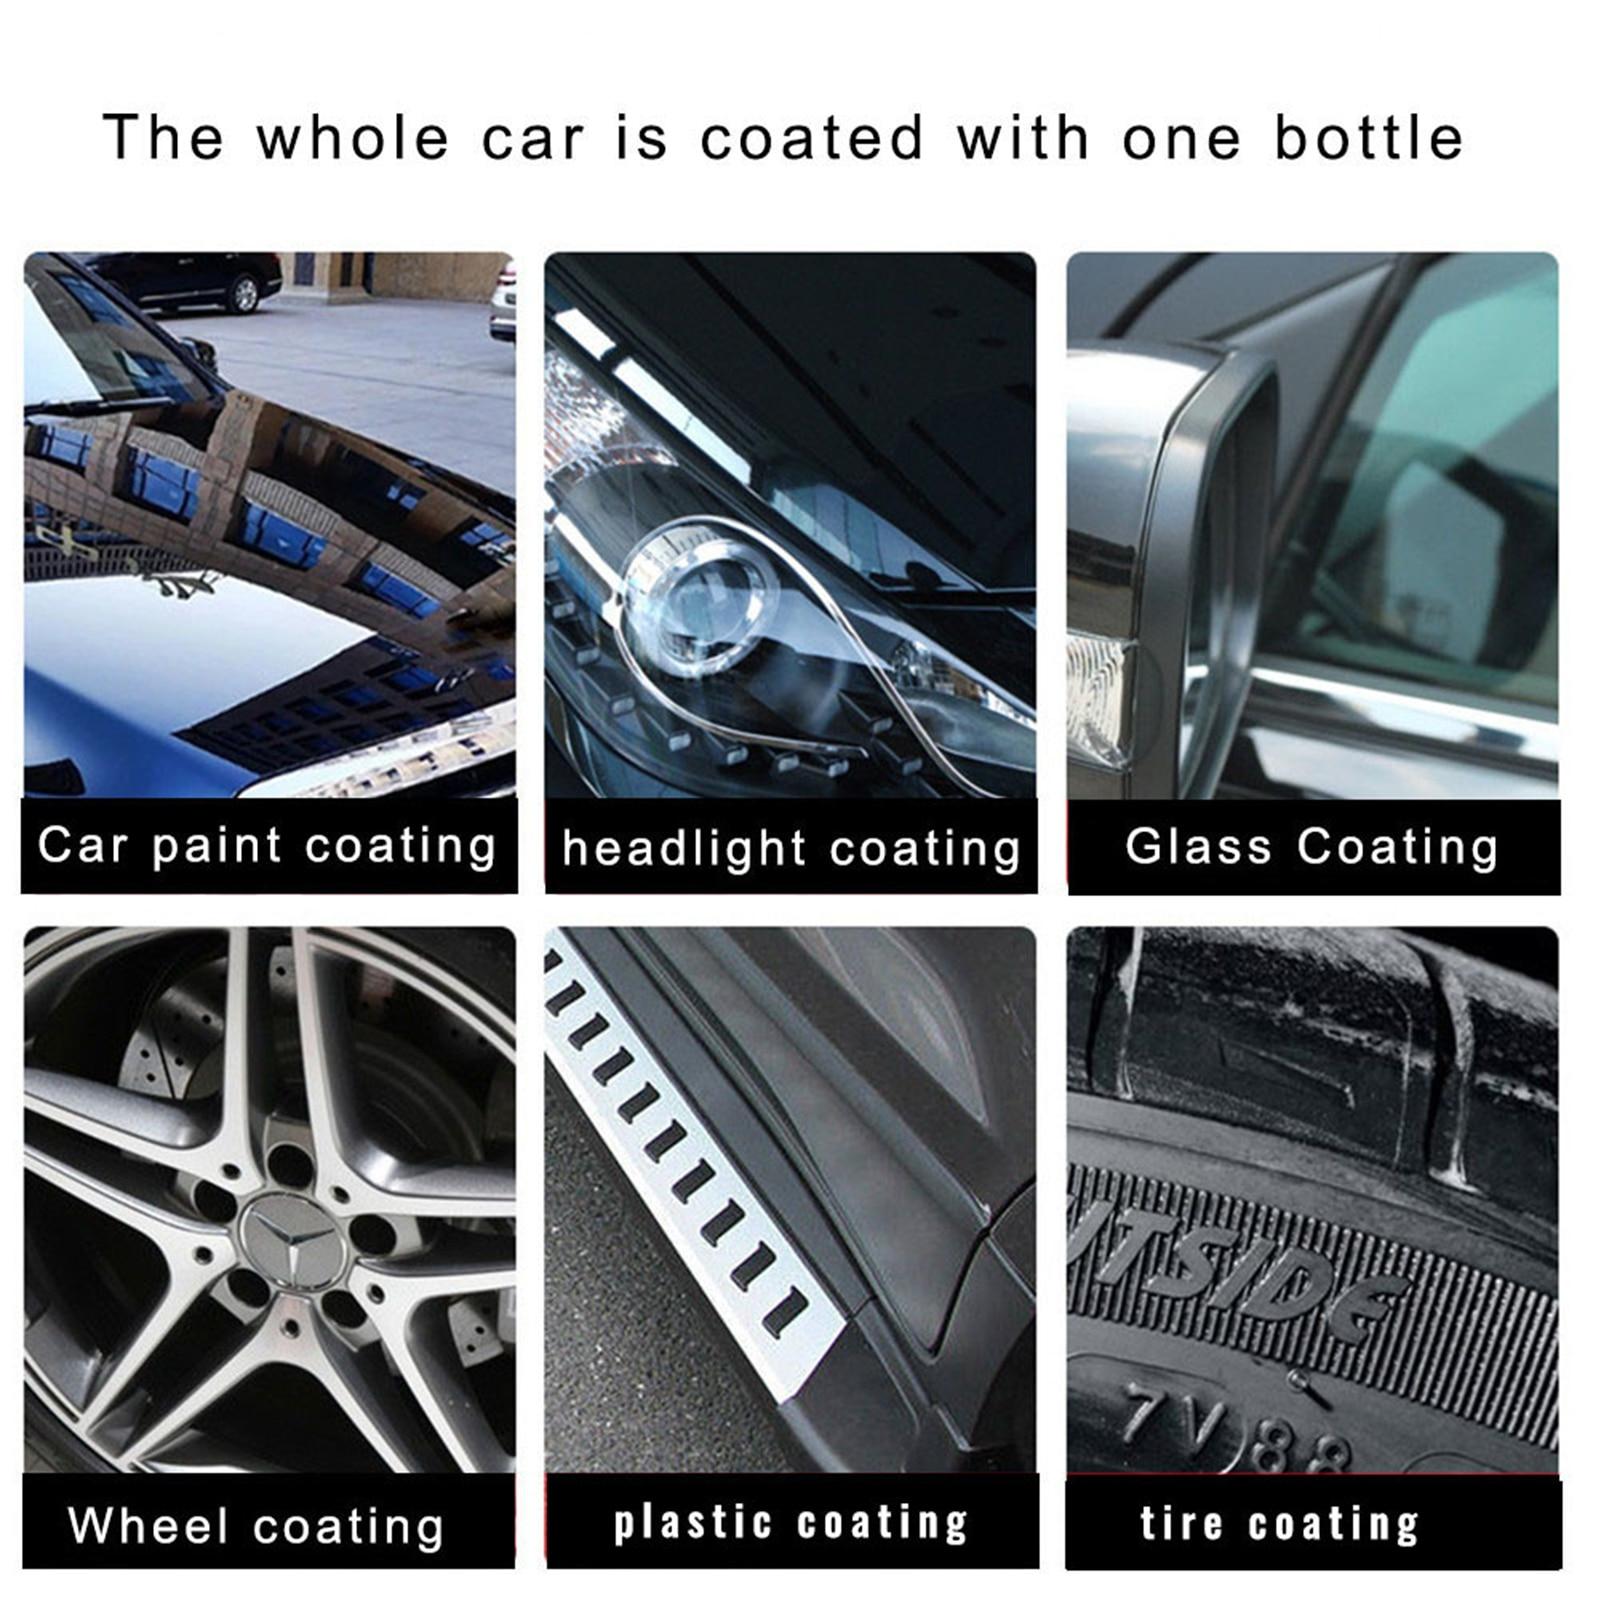 500ml Automotive Ceramic Coating Nano Glass Plated Crystal Liquid Hydrophobic Coating Car Polish Clean spray Paint Agent enlarge